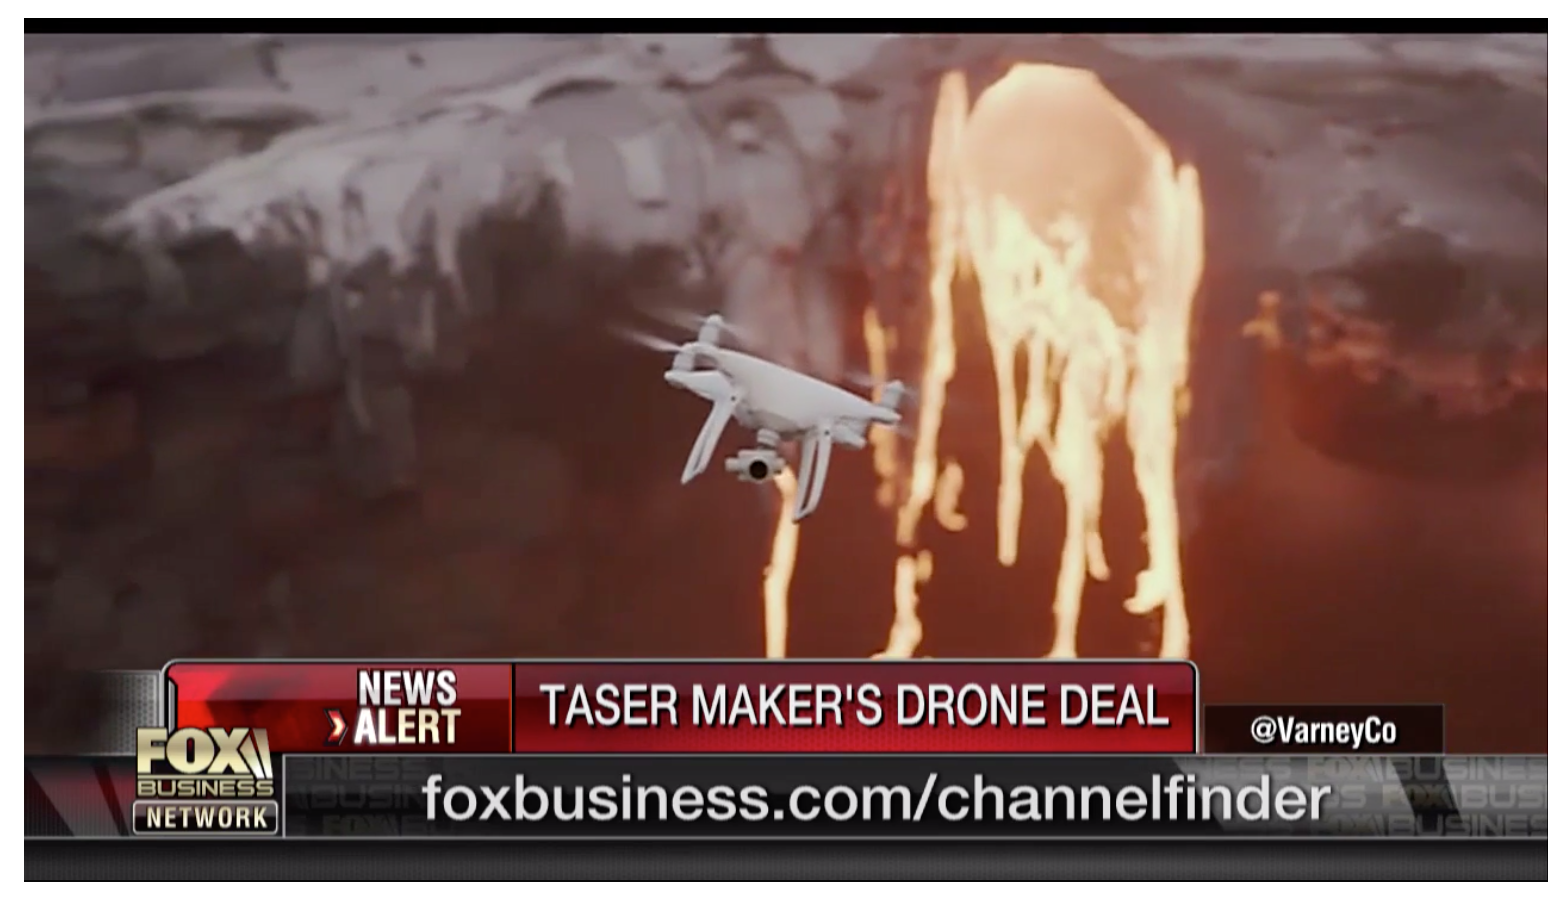 Image Credit: Fox Business